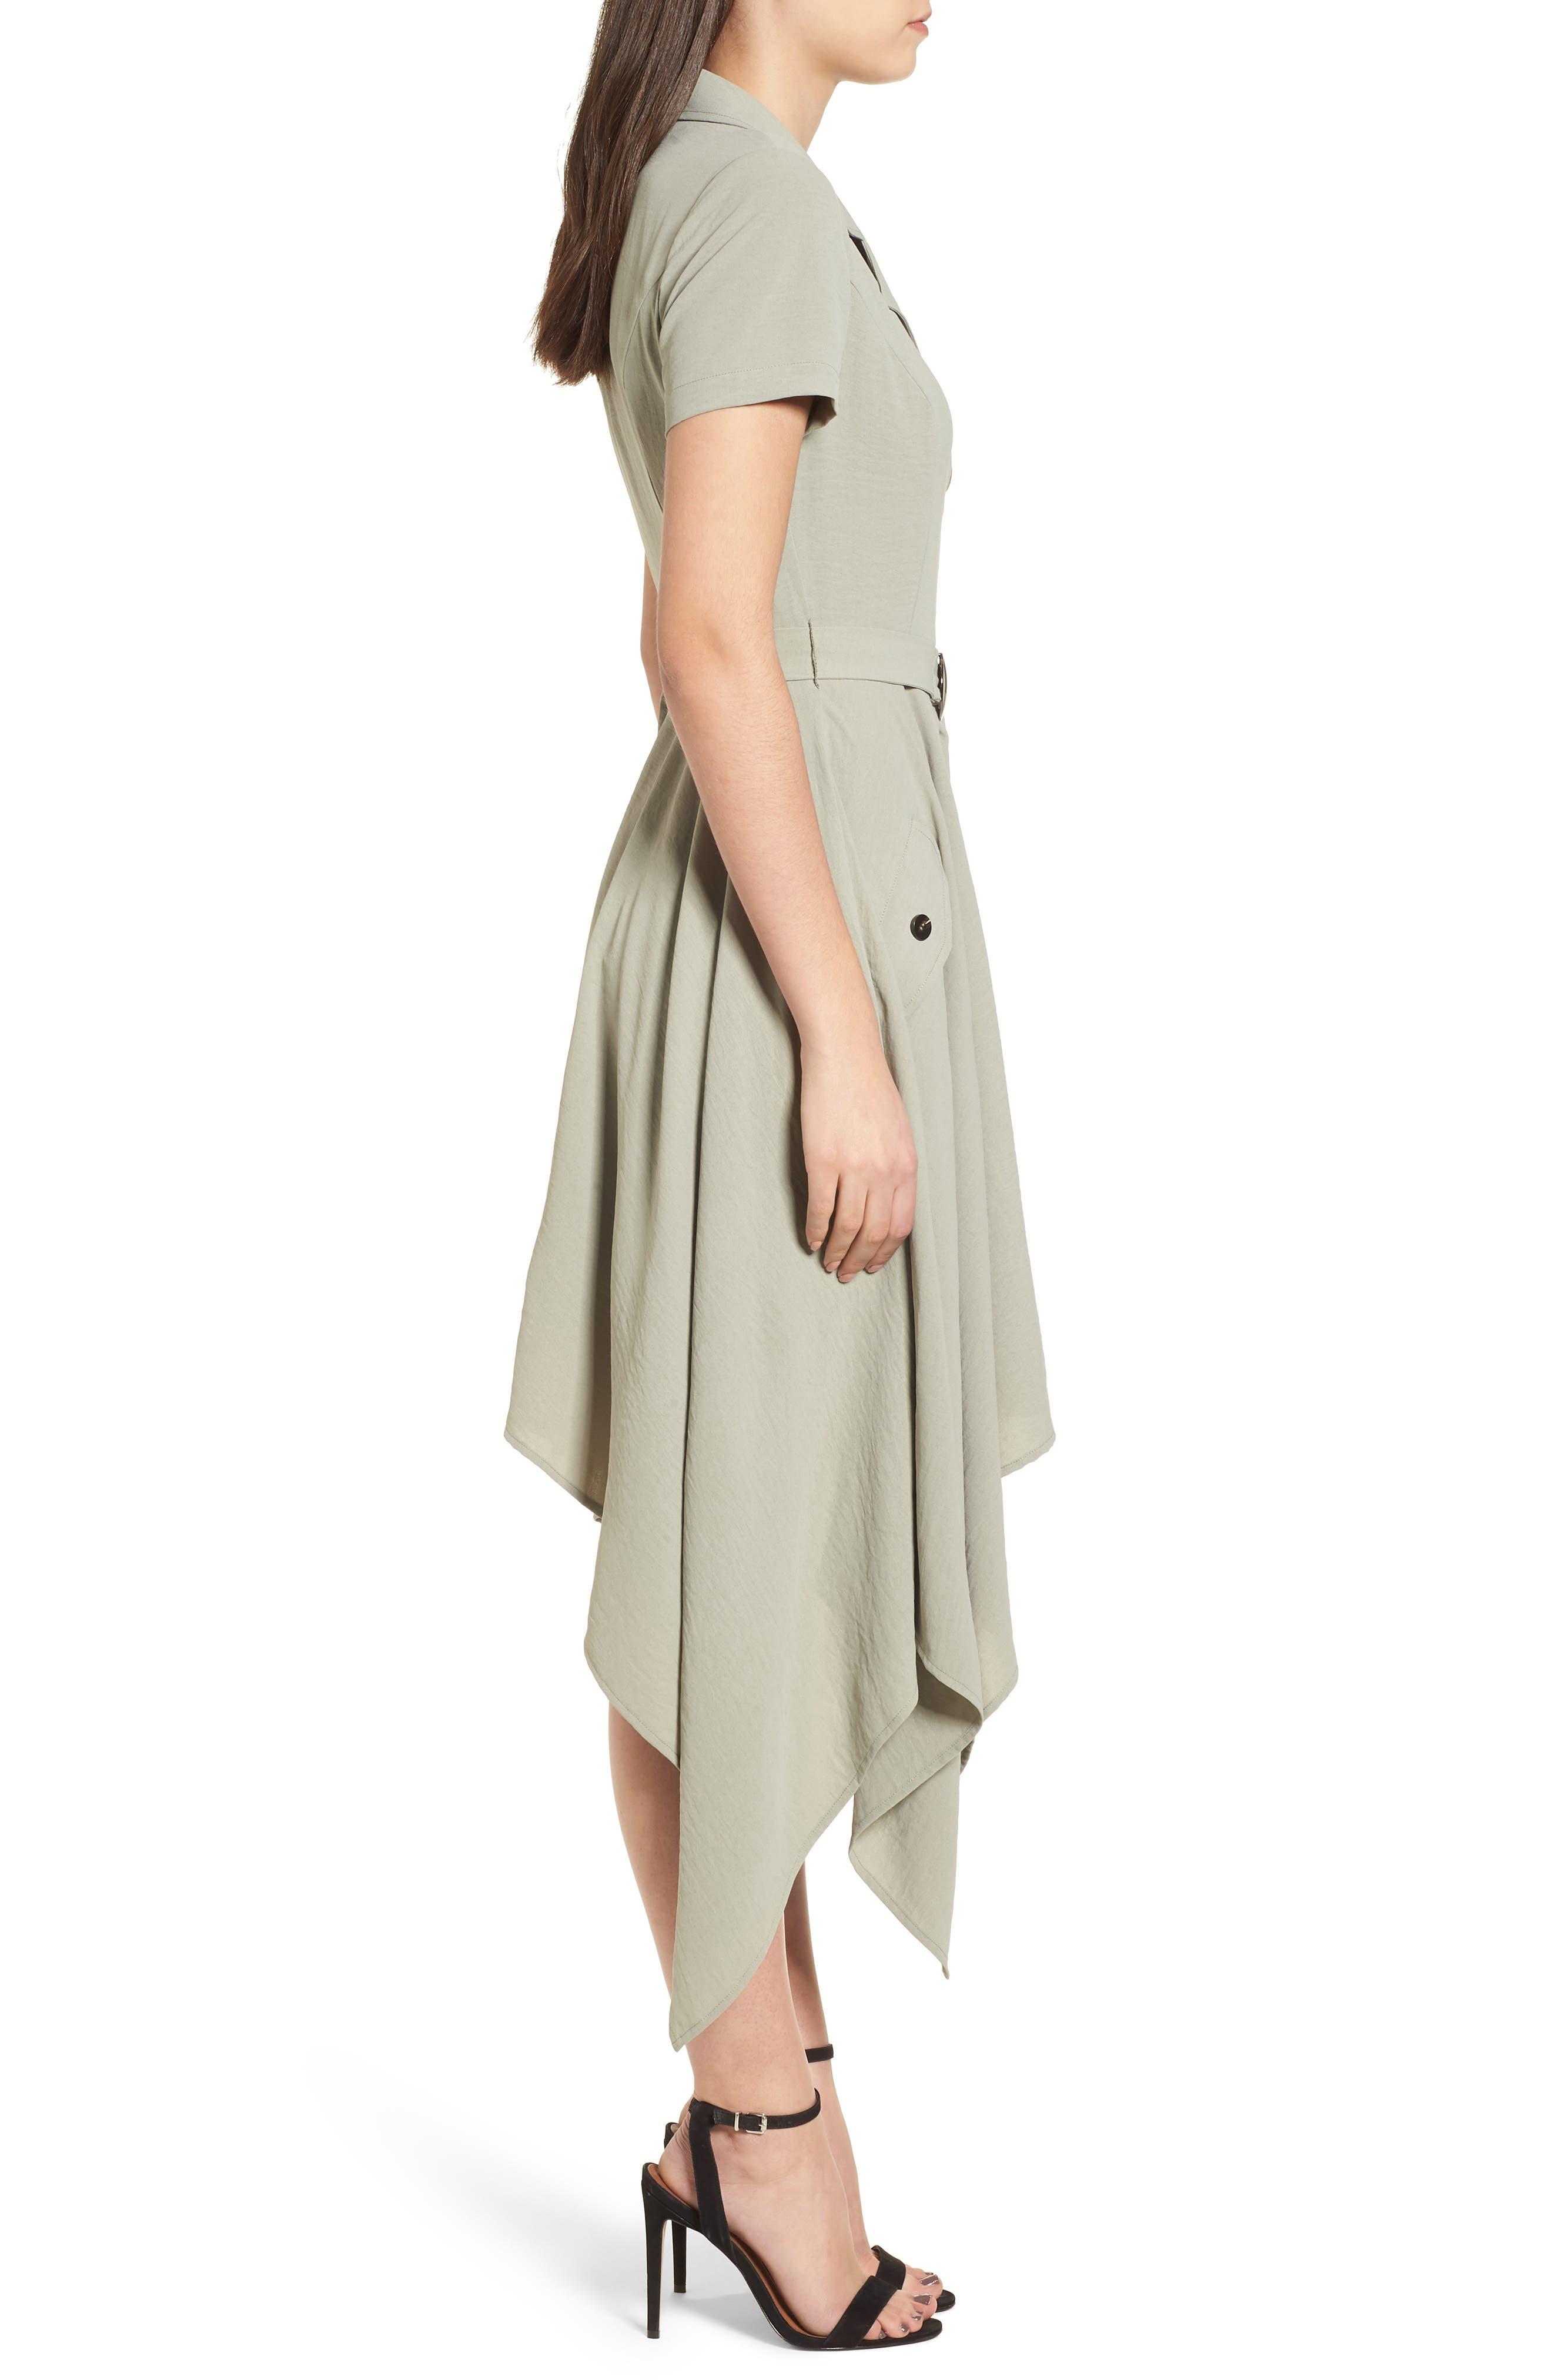 Chriselle x J.O.A. Asymmetrical Trench Dress,                             Alternate thumbnail 4, color,                             300